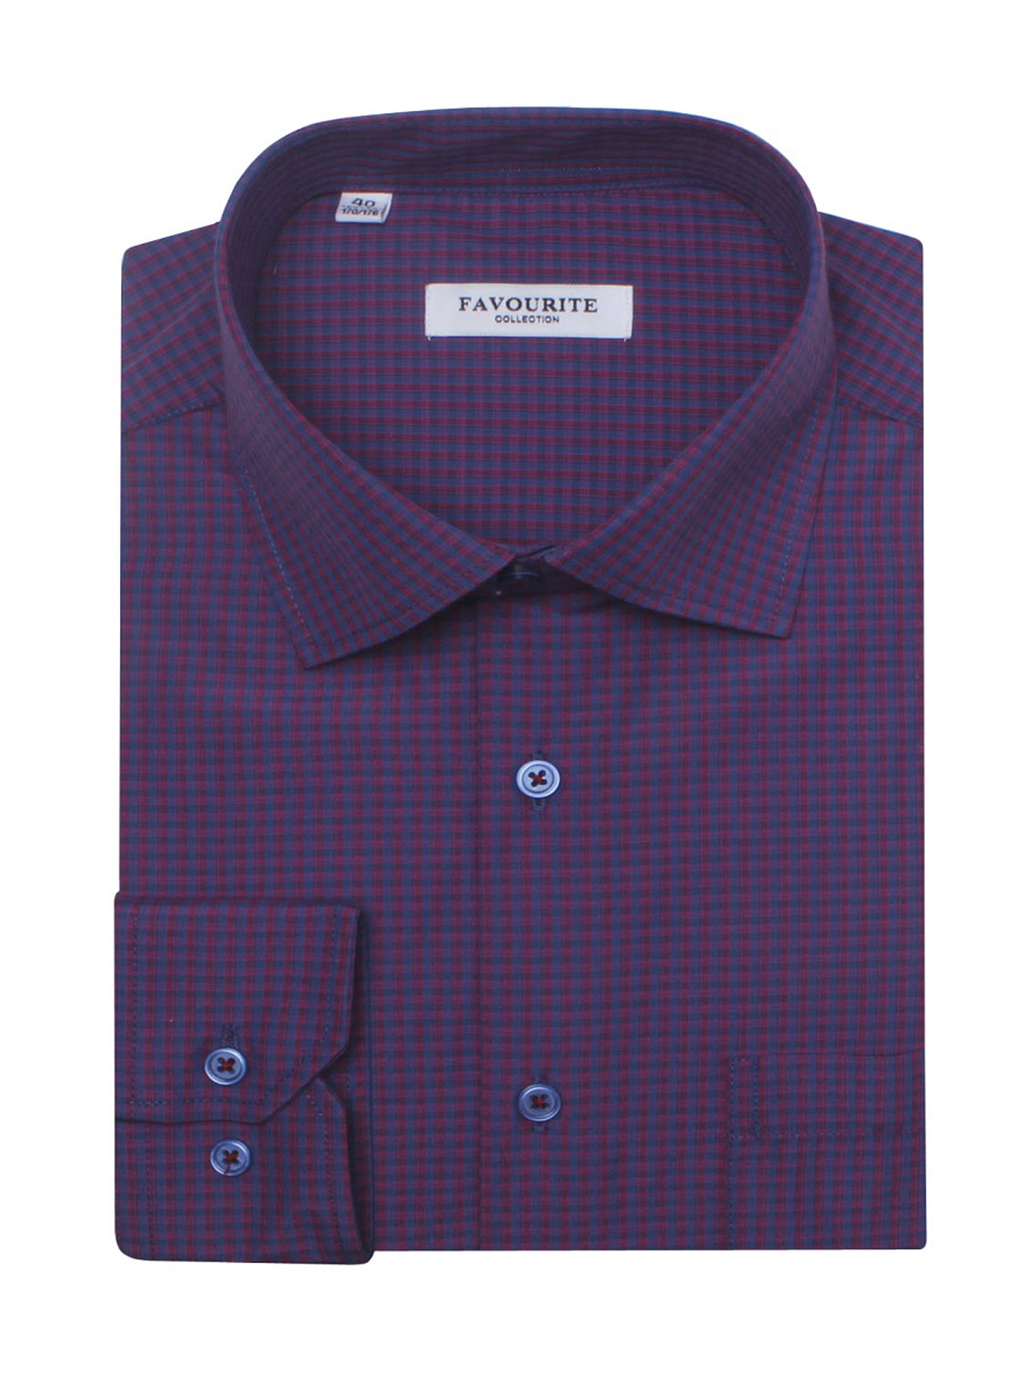 Рубашка мужская 05, Favourite фото